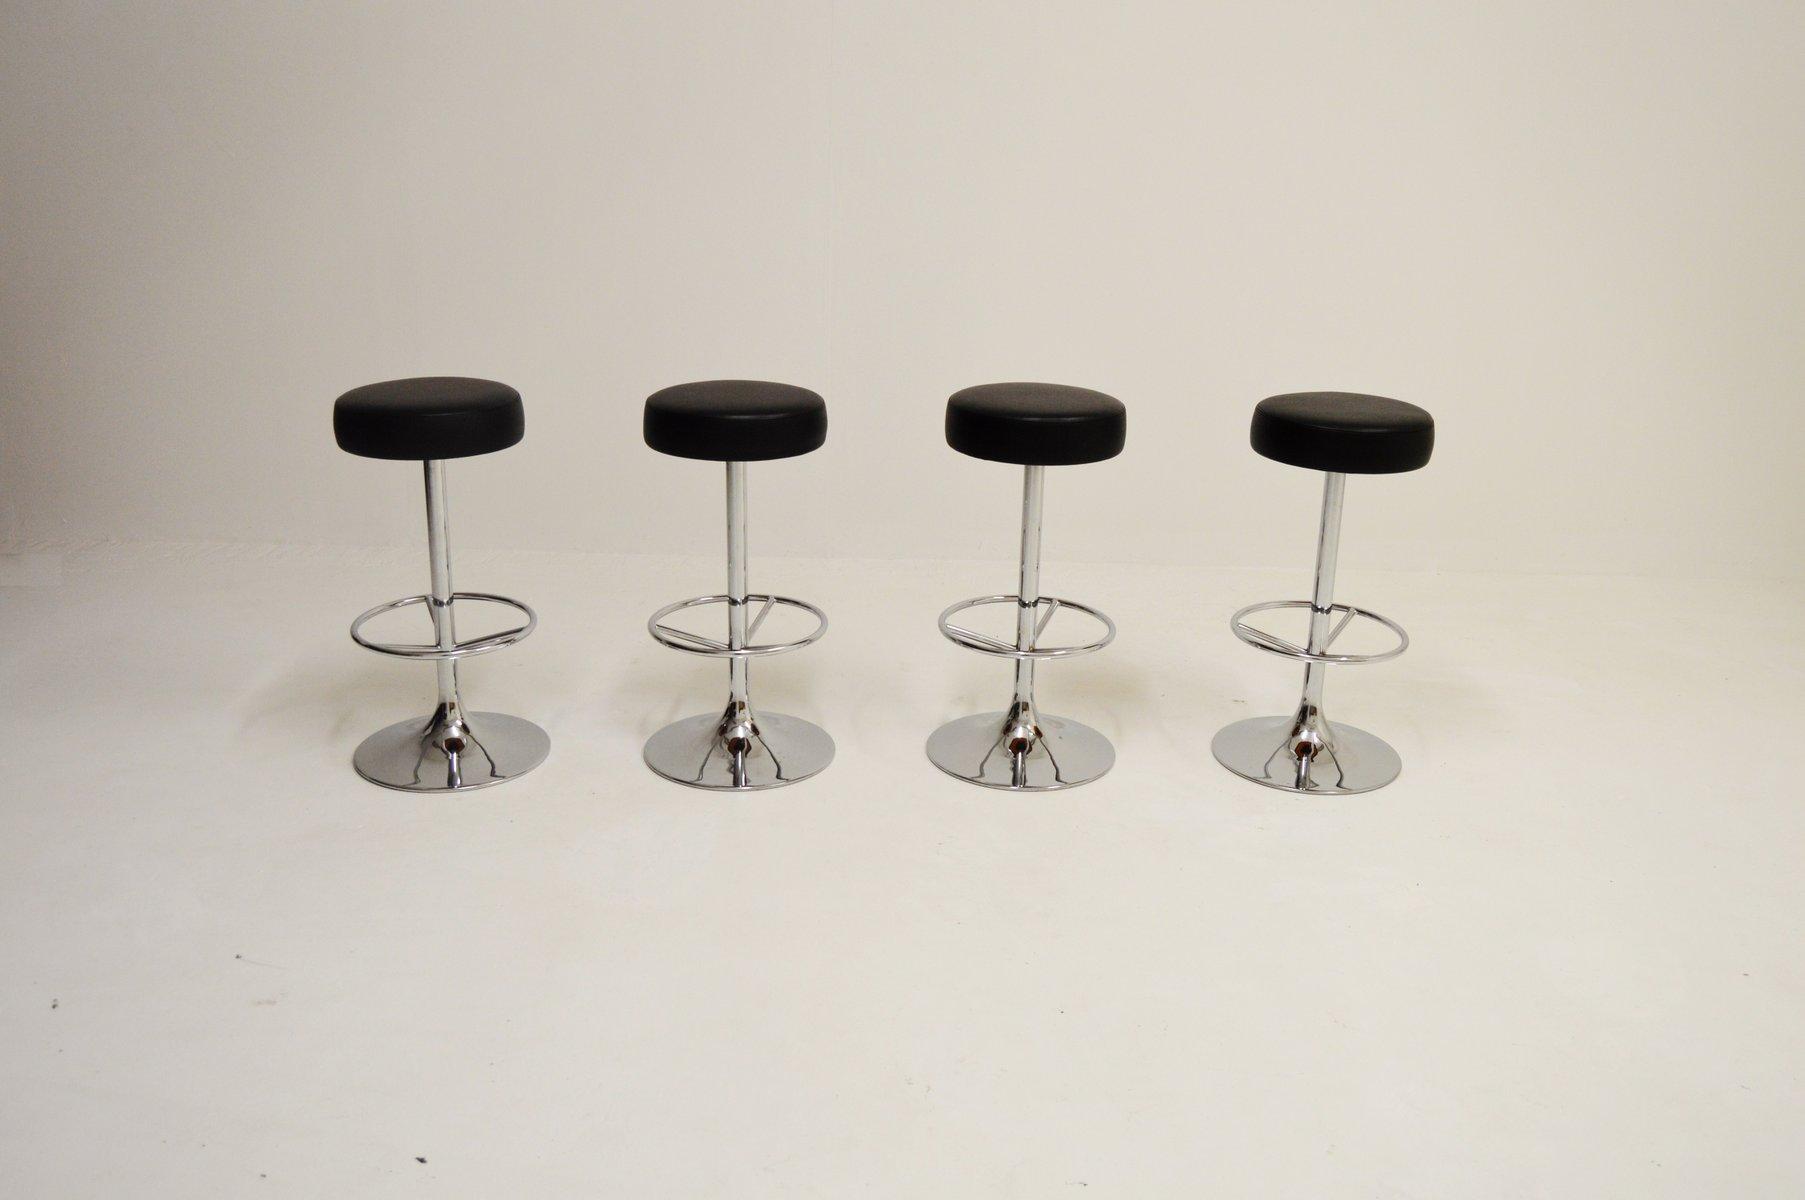 Vintage Chromed Bar Stools From Johansson Design Set Of 4